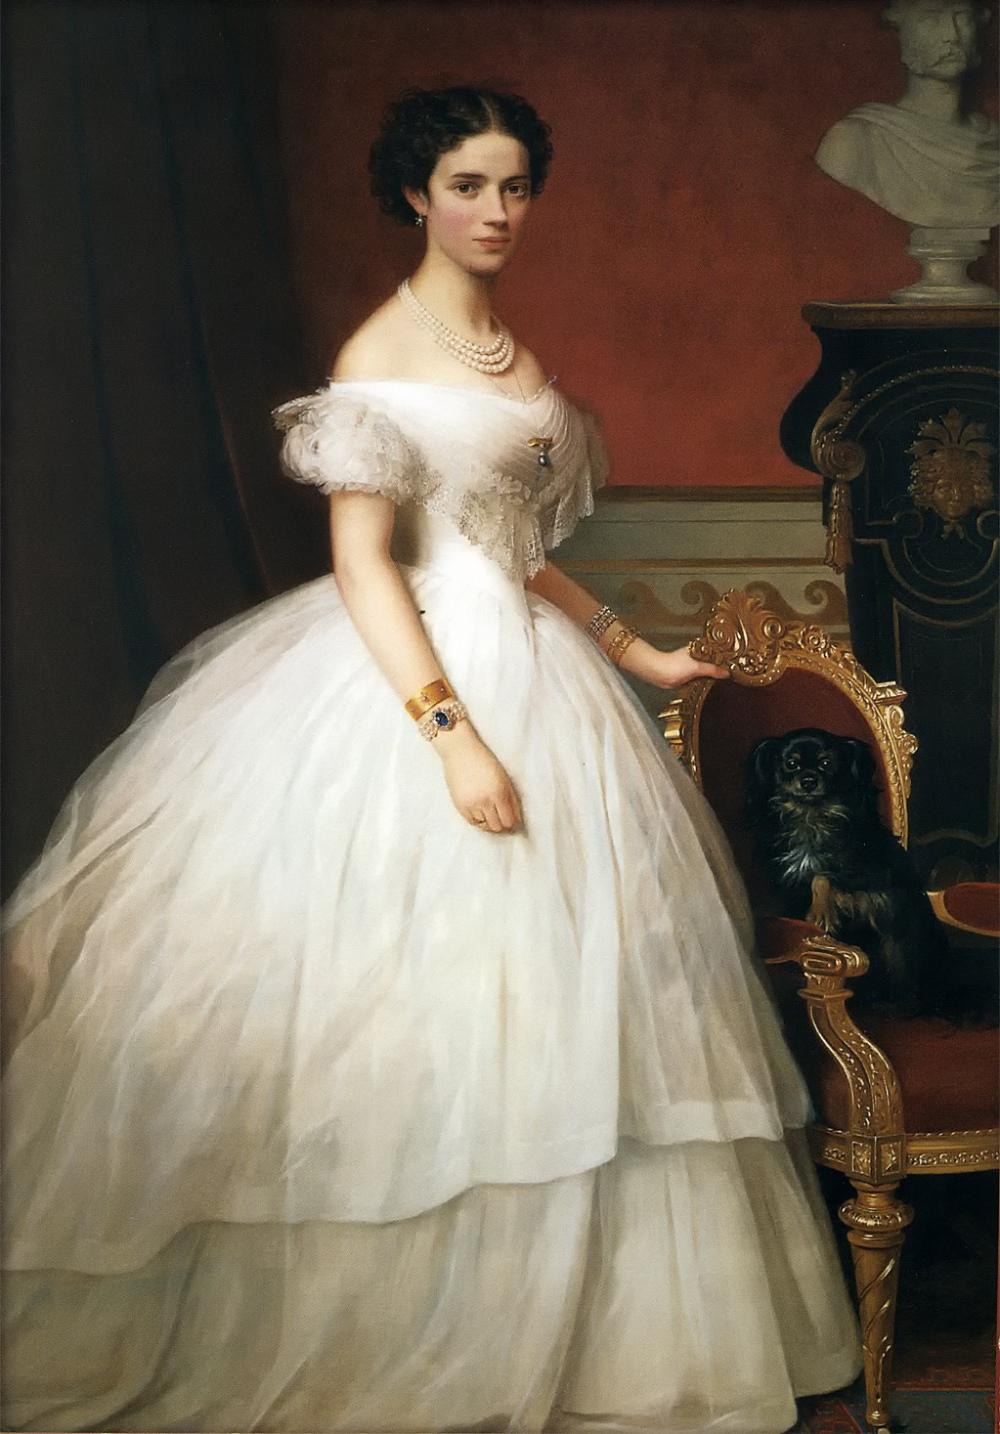 A. Hunæus. Princesa Dagmarde Dinamarca con su perro. Hacia 1860. Museo Amalienborg. Copenhague.